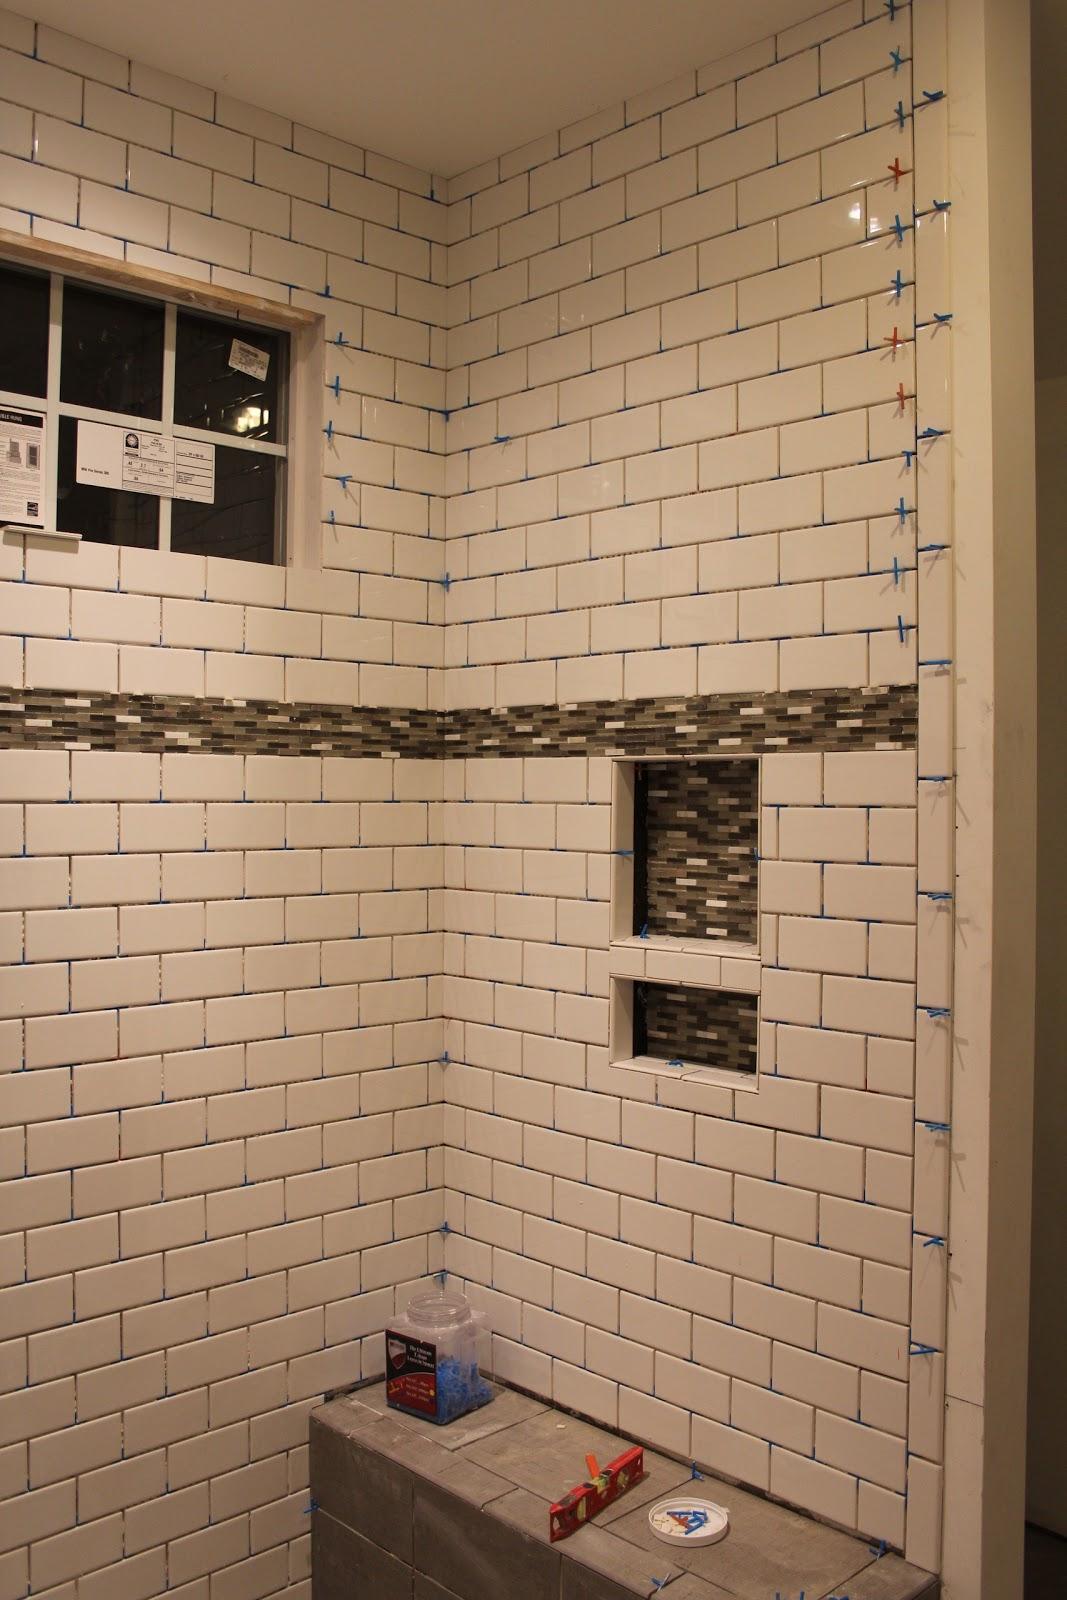 Kelleytime Day Master Bath Remodel - 2 day bathroom remodel